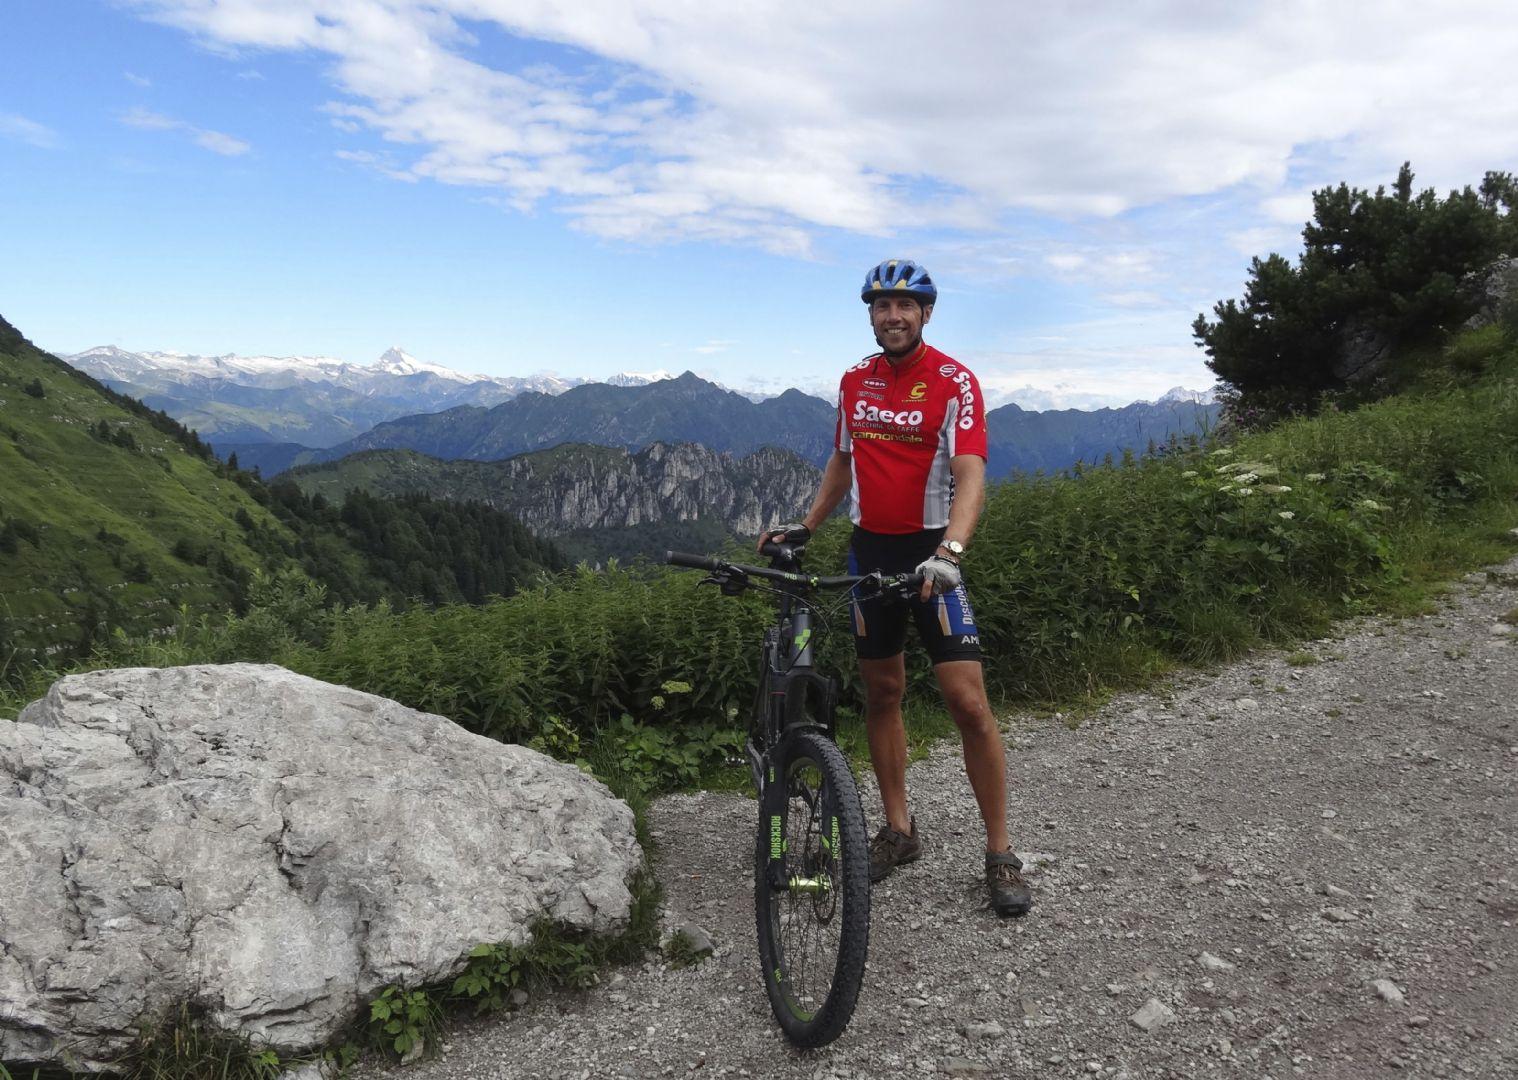 _Customer.58397.17898 2.jpg - Italy - Dolomites to Garda - Guided Mountain Bike Holiday - Italia Mountain Biking